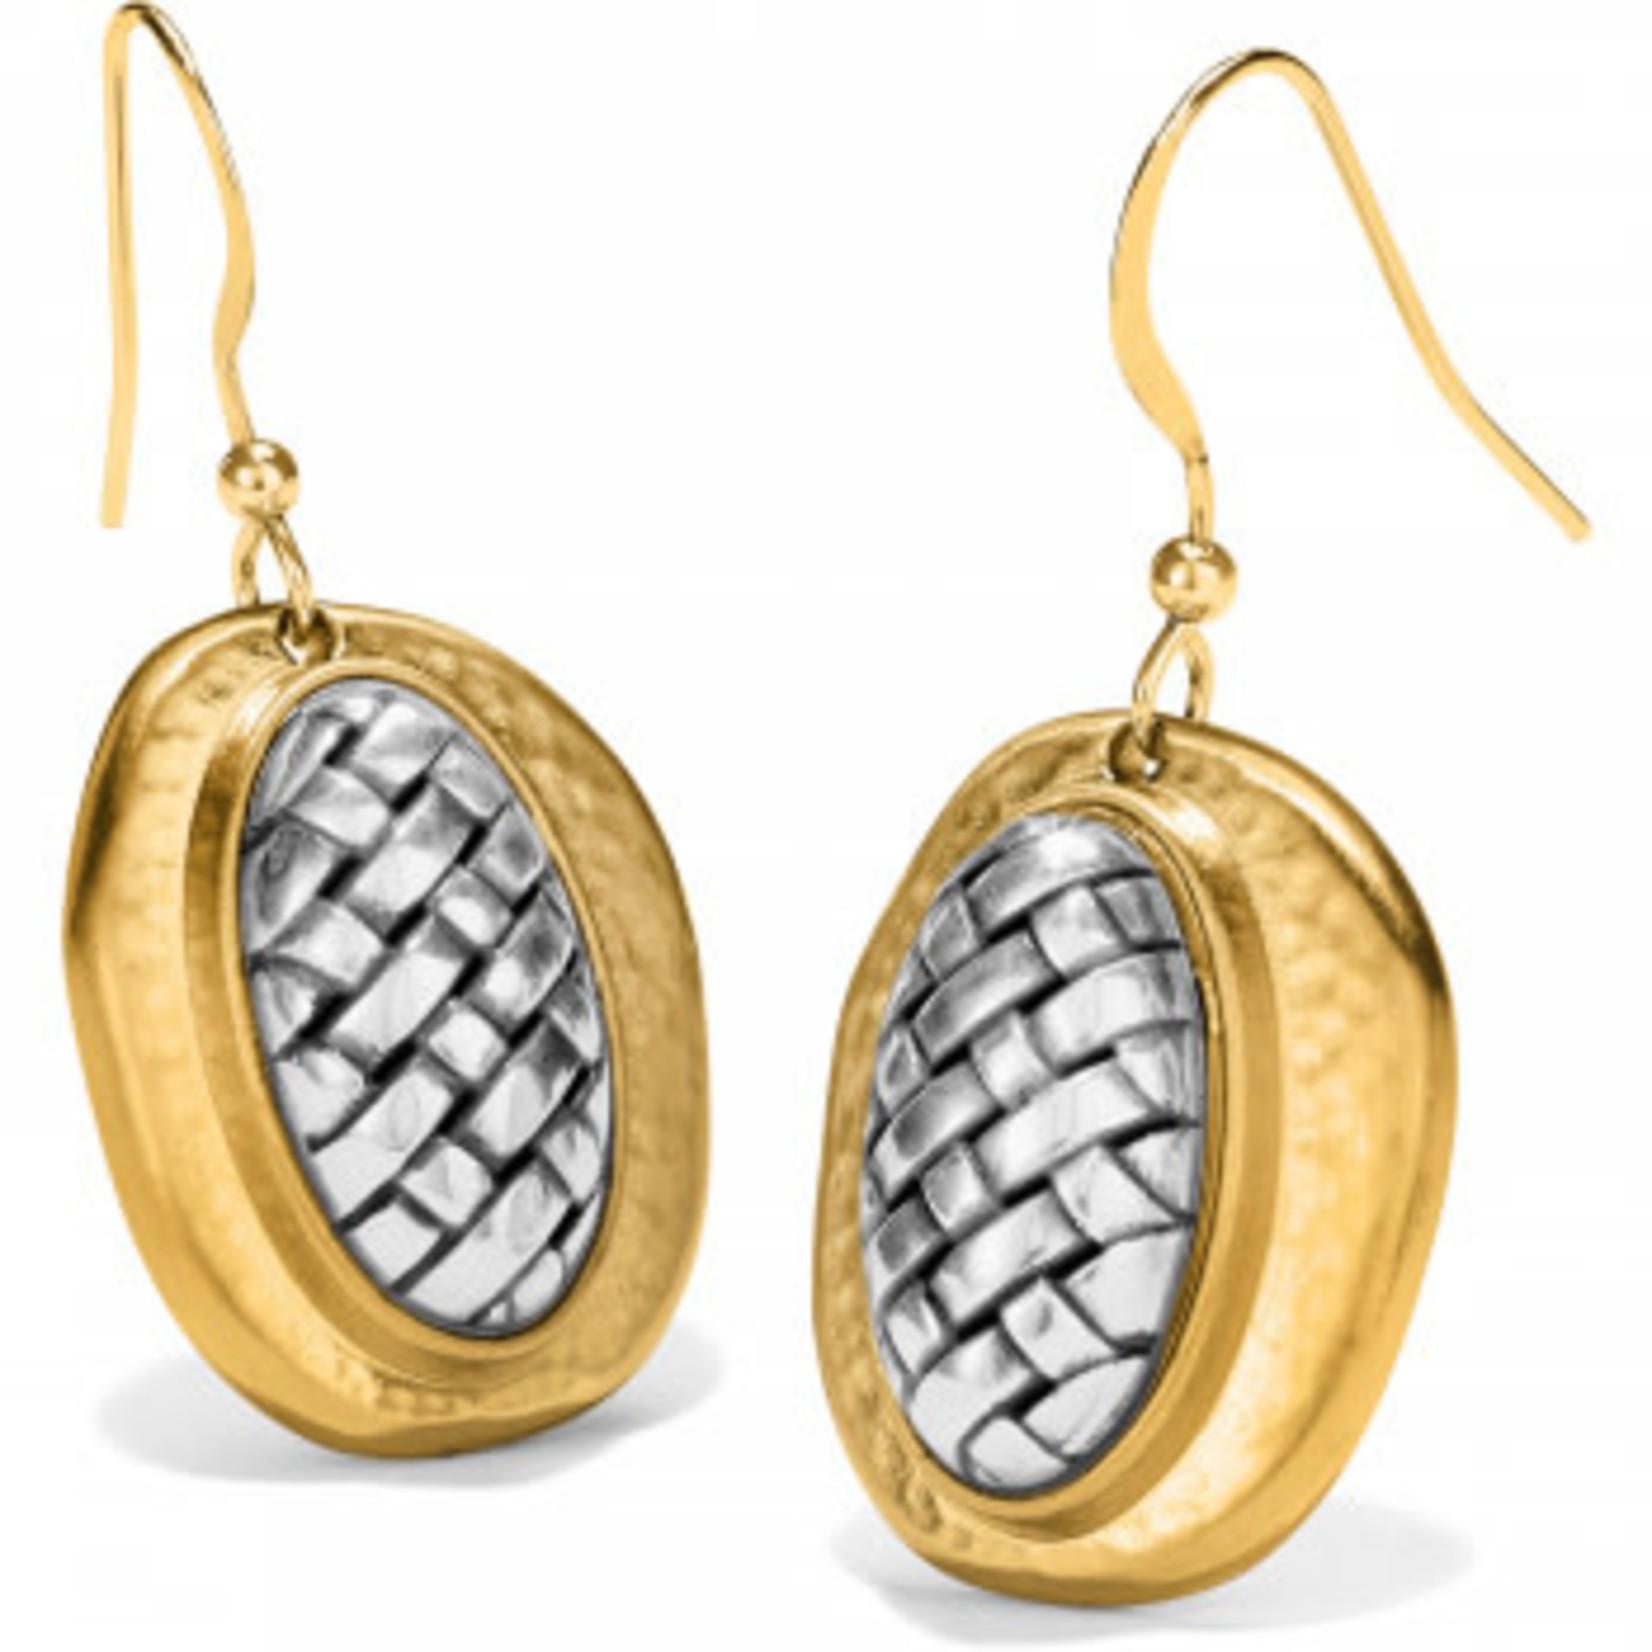 Brighton Ferrara Artisan Two Tone French Wire Earrings Silver-Gold